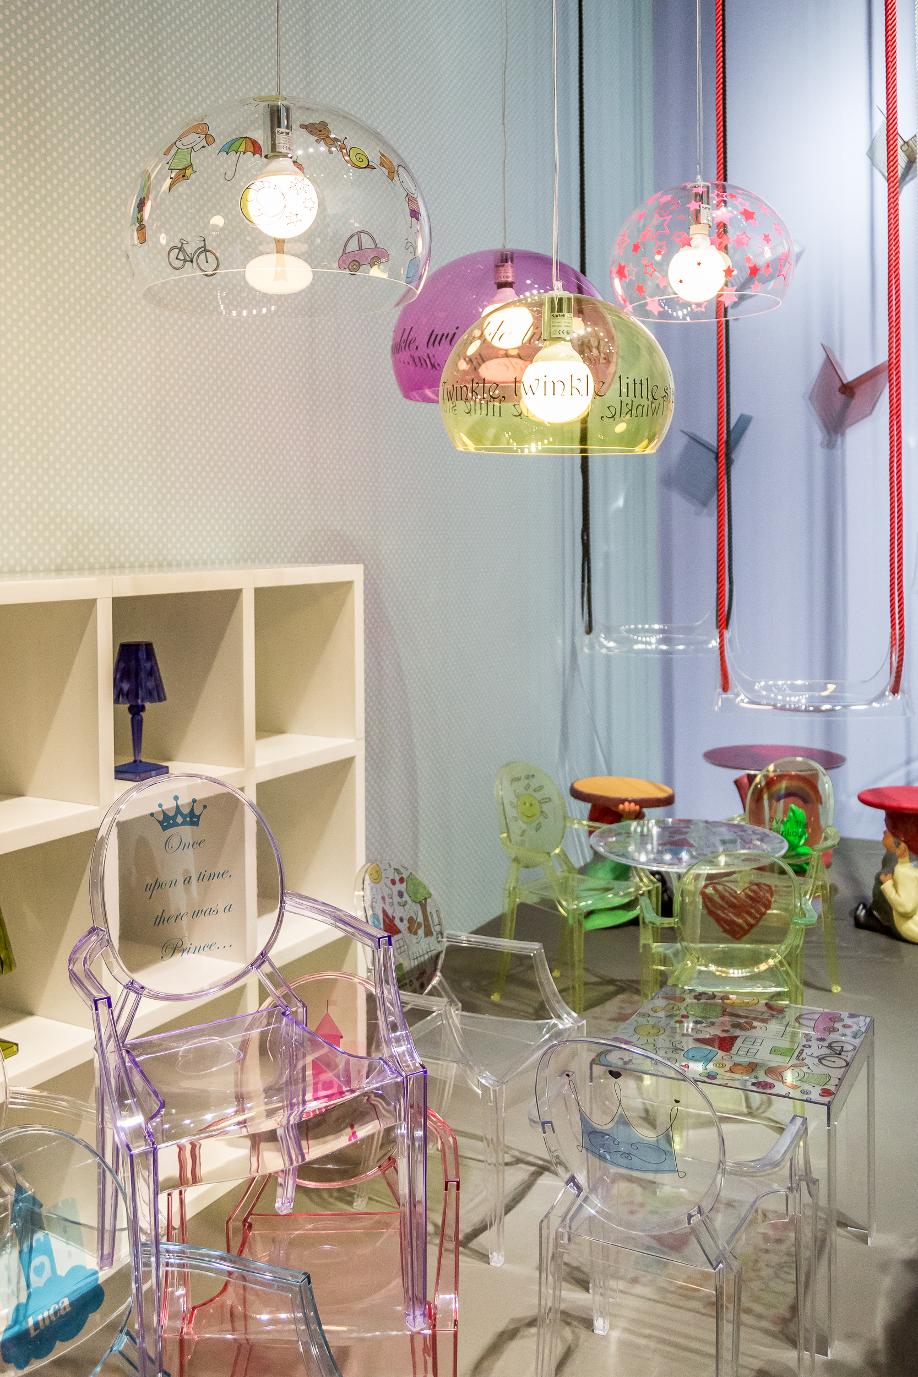 westwing-salone-del-mobile-glasstuhl-lila